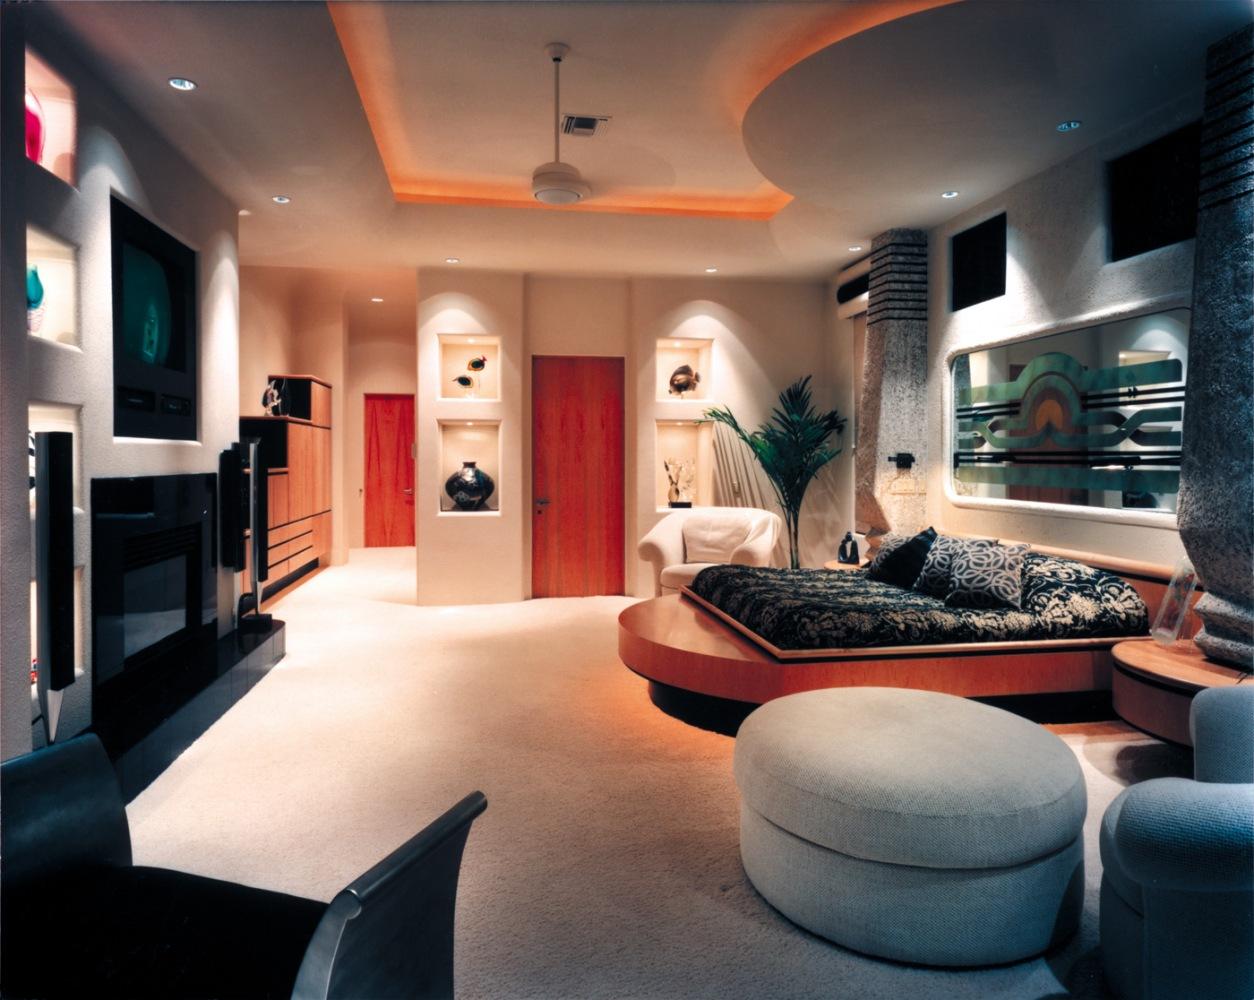 5500-Isleworth-Country-Club-Drive-Master-Bedroom-9.jpg